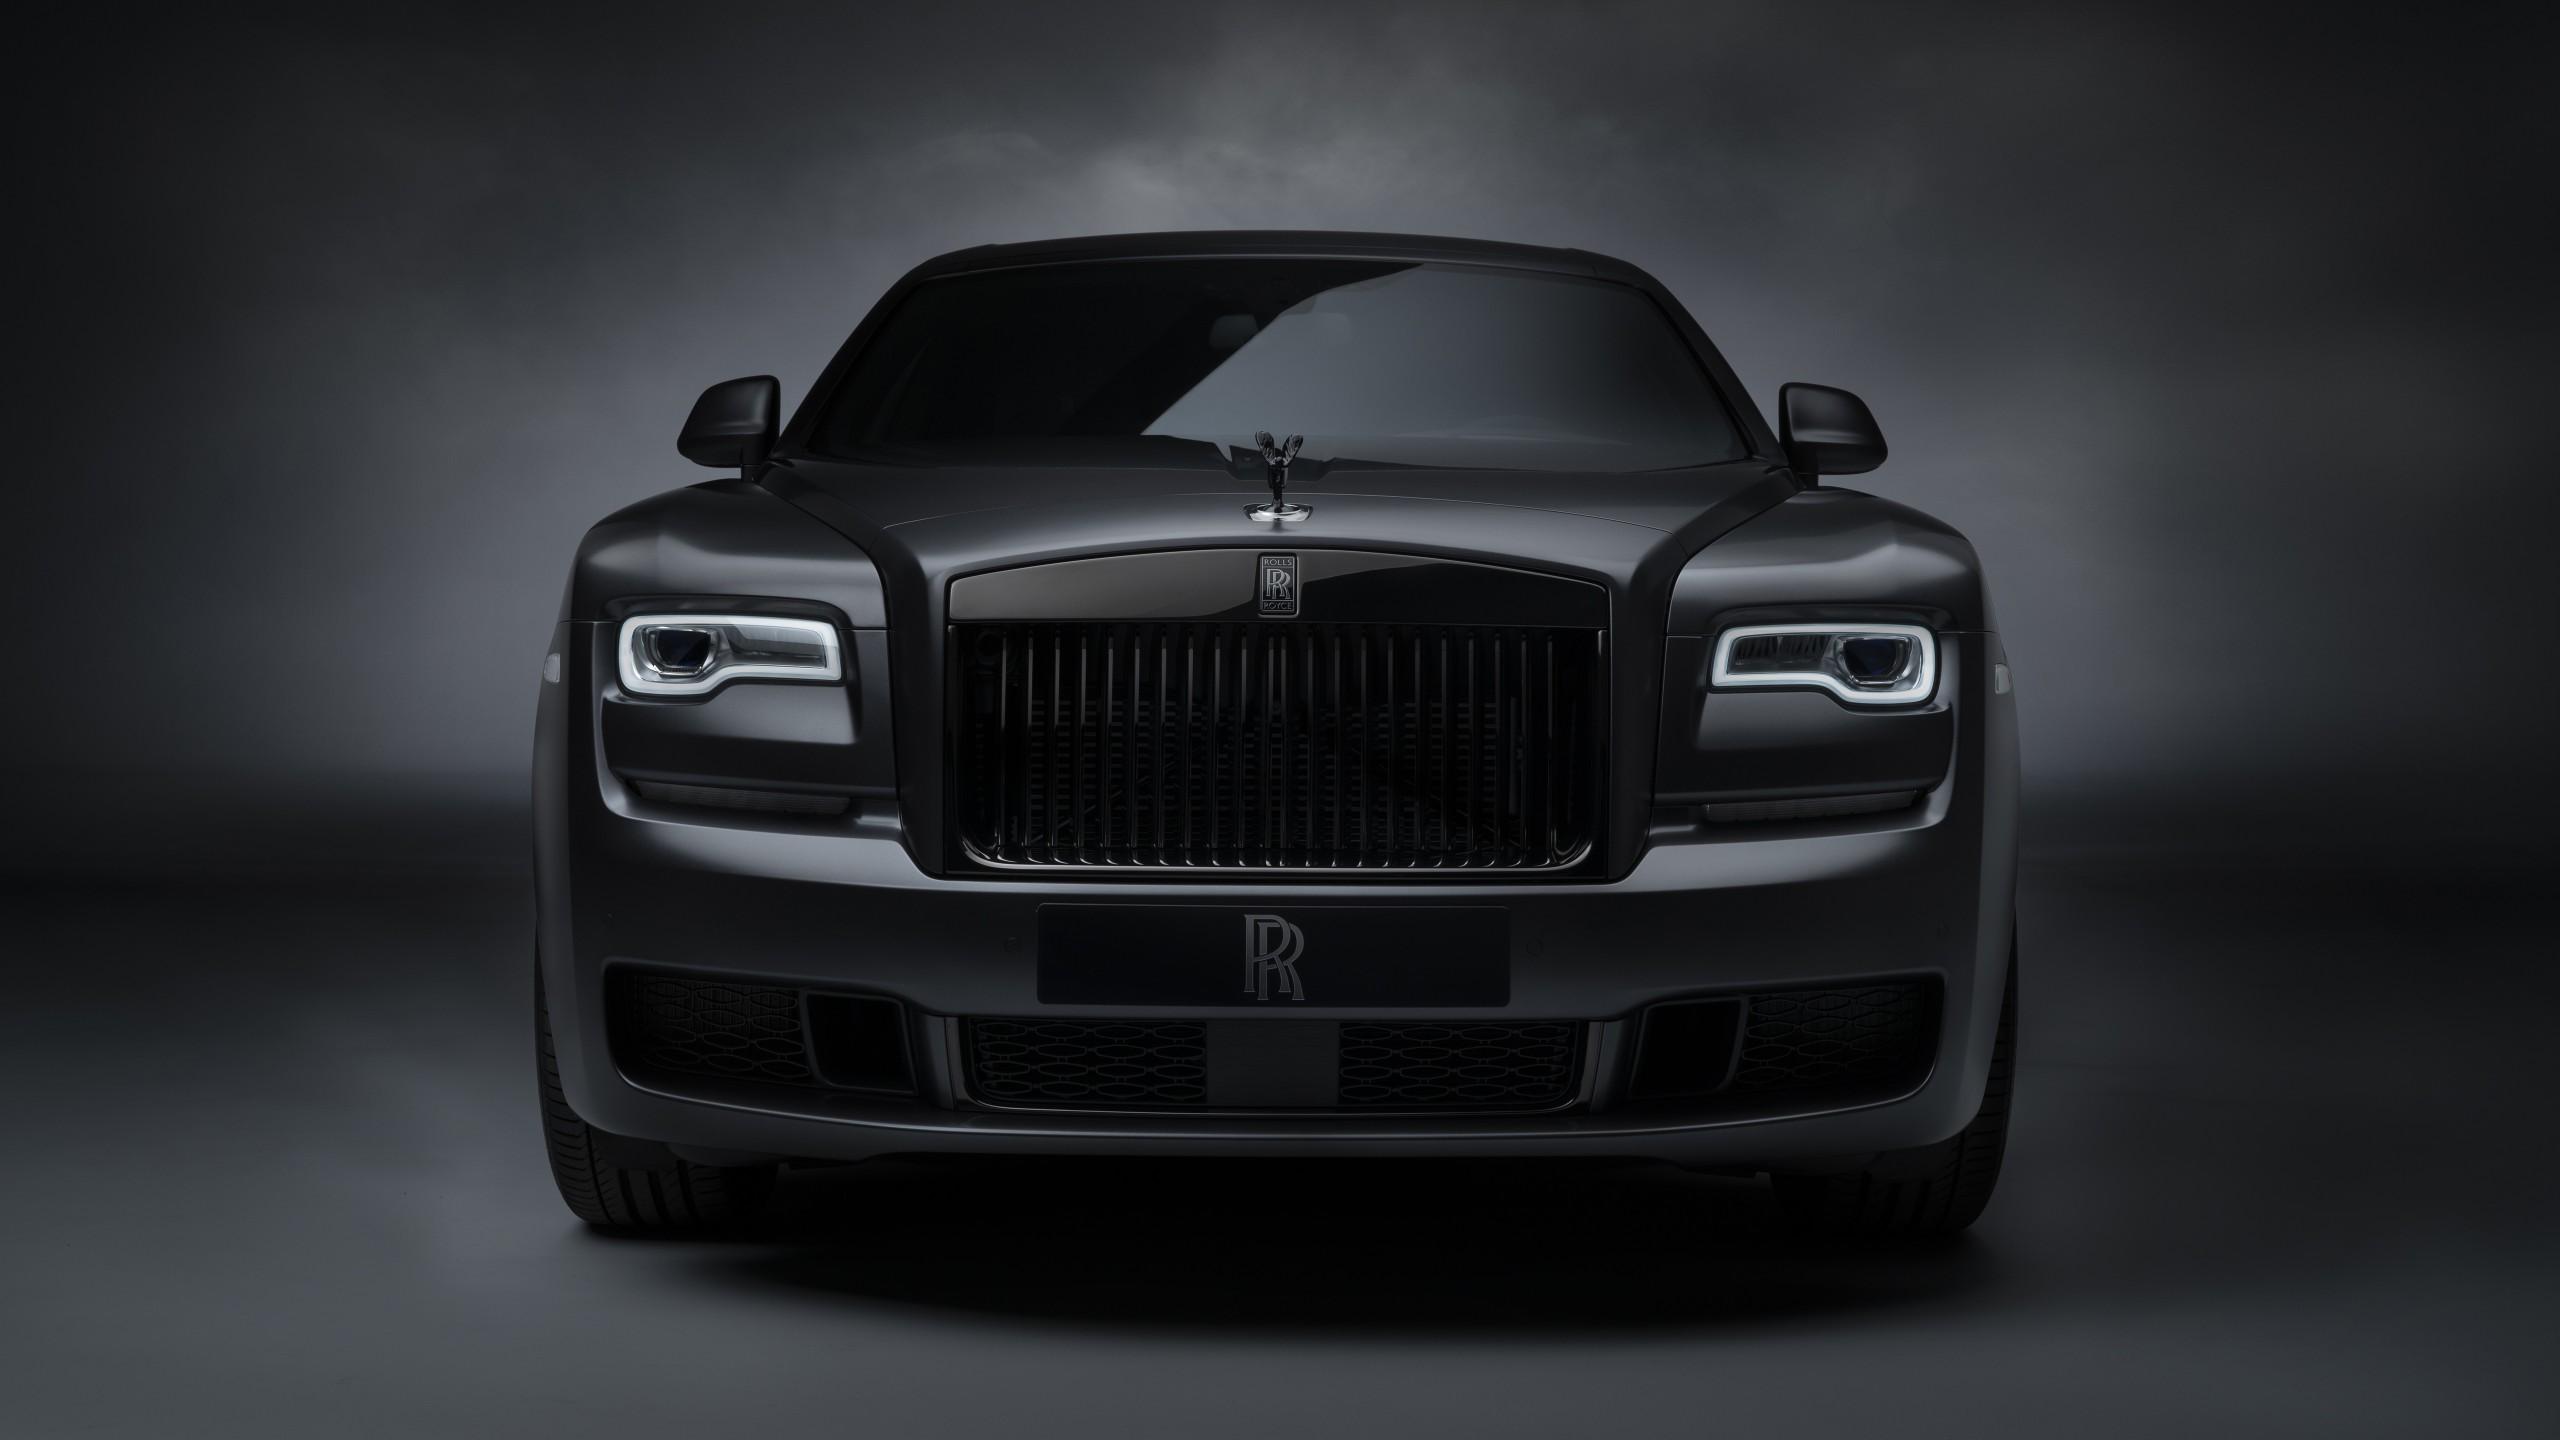 Rolls Royce Phantom >> Rolls-Royce Ghost Black Badge 2019 5K 2 Wallpaper | HD Car ...